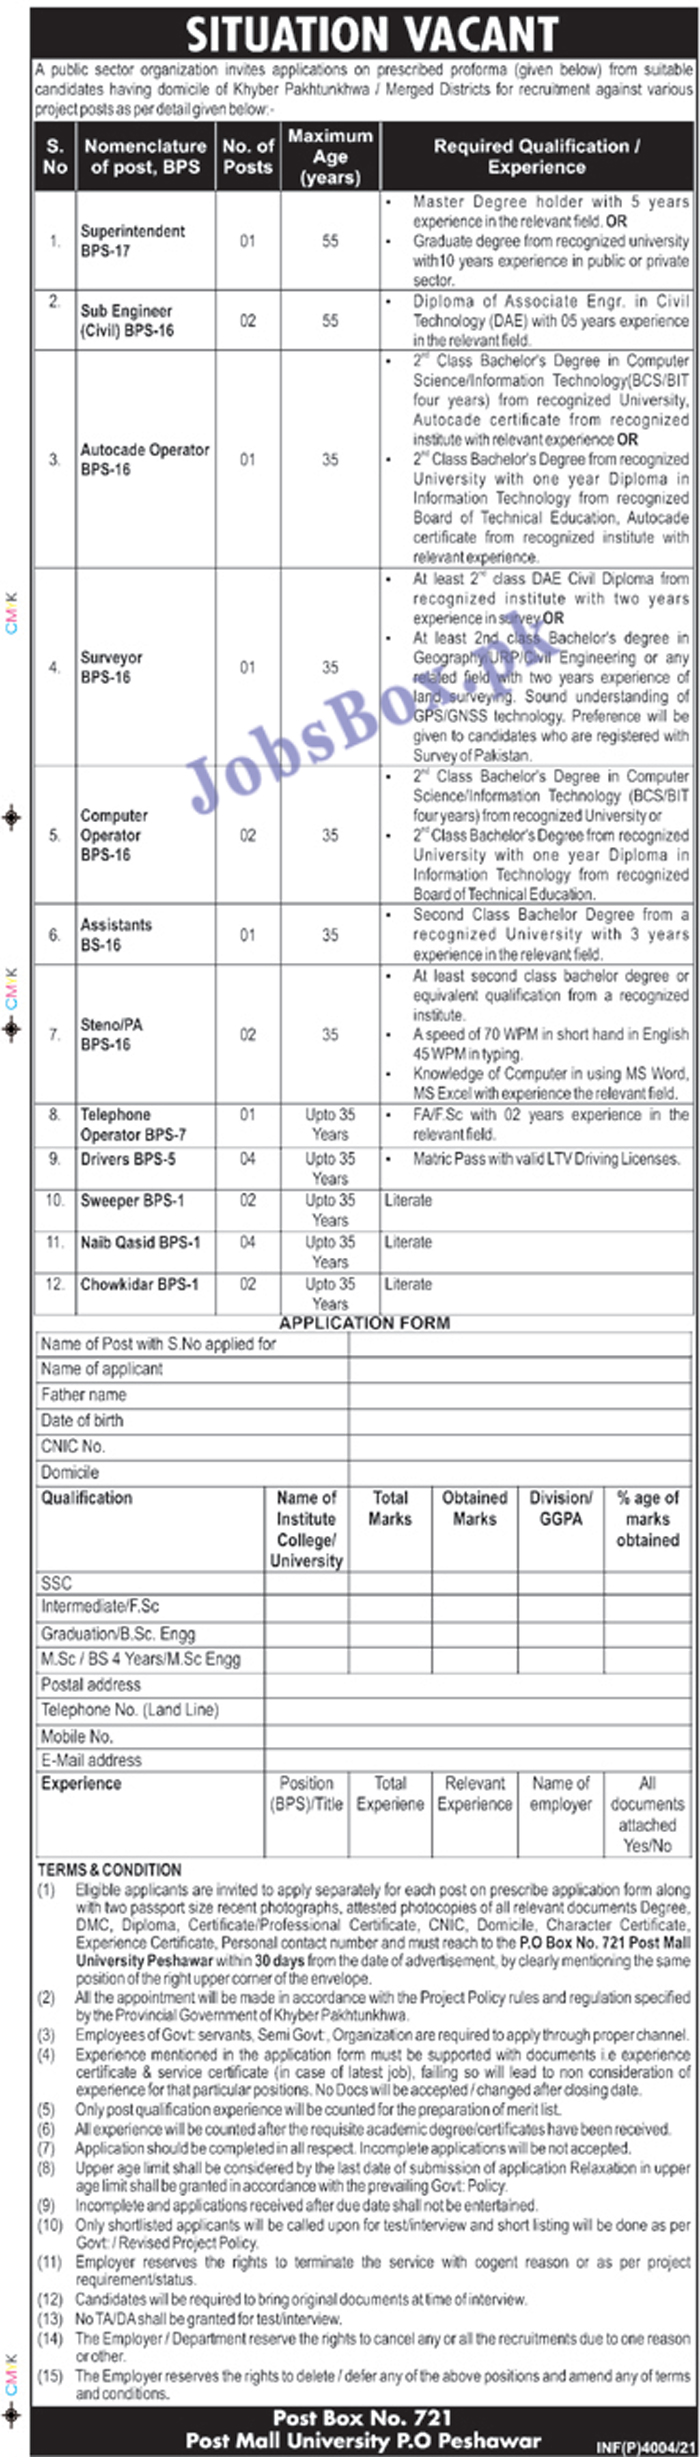 Public Sector Organization Peshawar Jobs 2021 – PO Box No 741 Peshawar Jobs